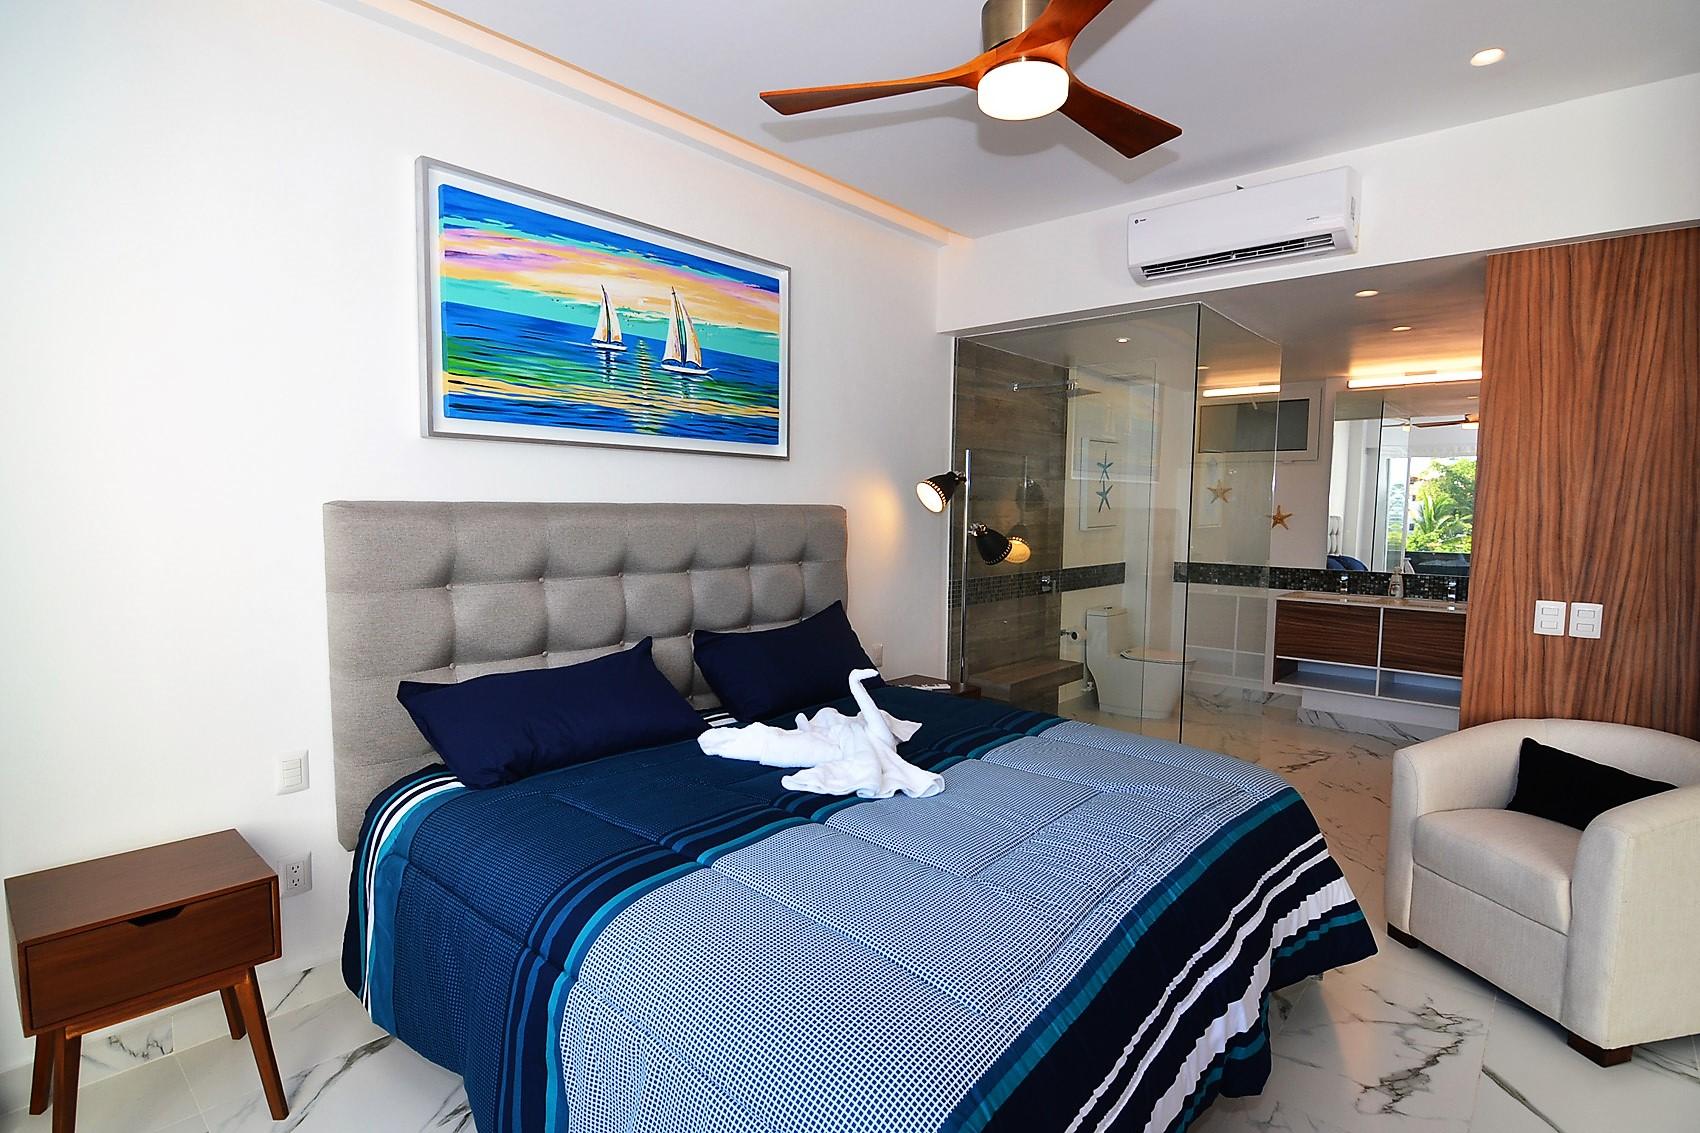 Condo Avida Super Studio 4 - Puerto Vallarta Furnished Condo Romantic Zone (20)